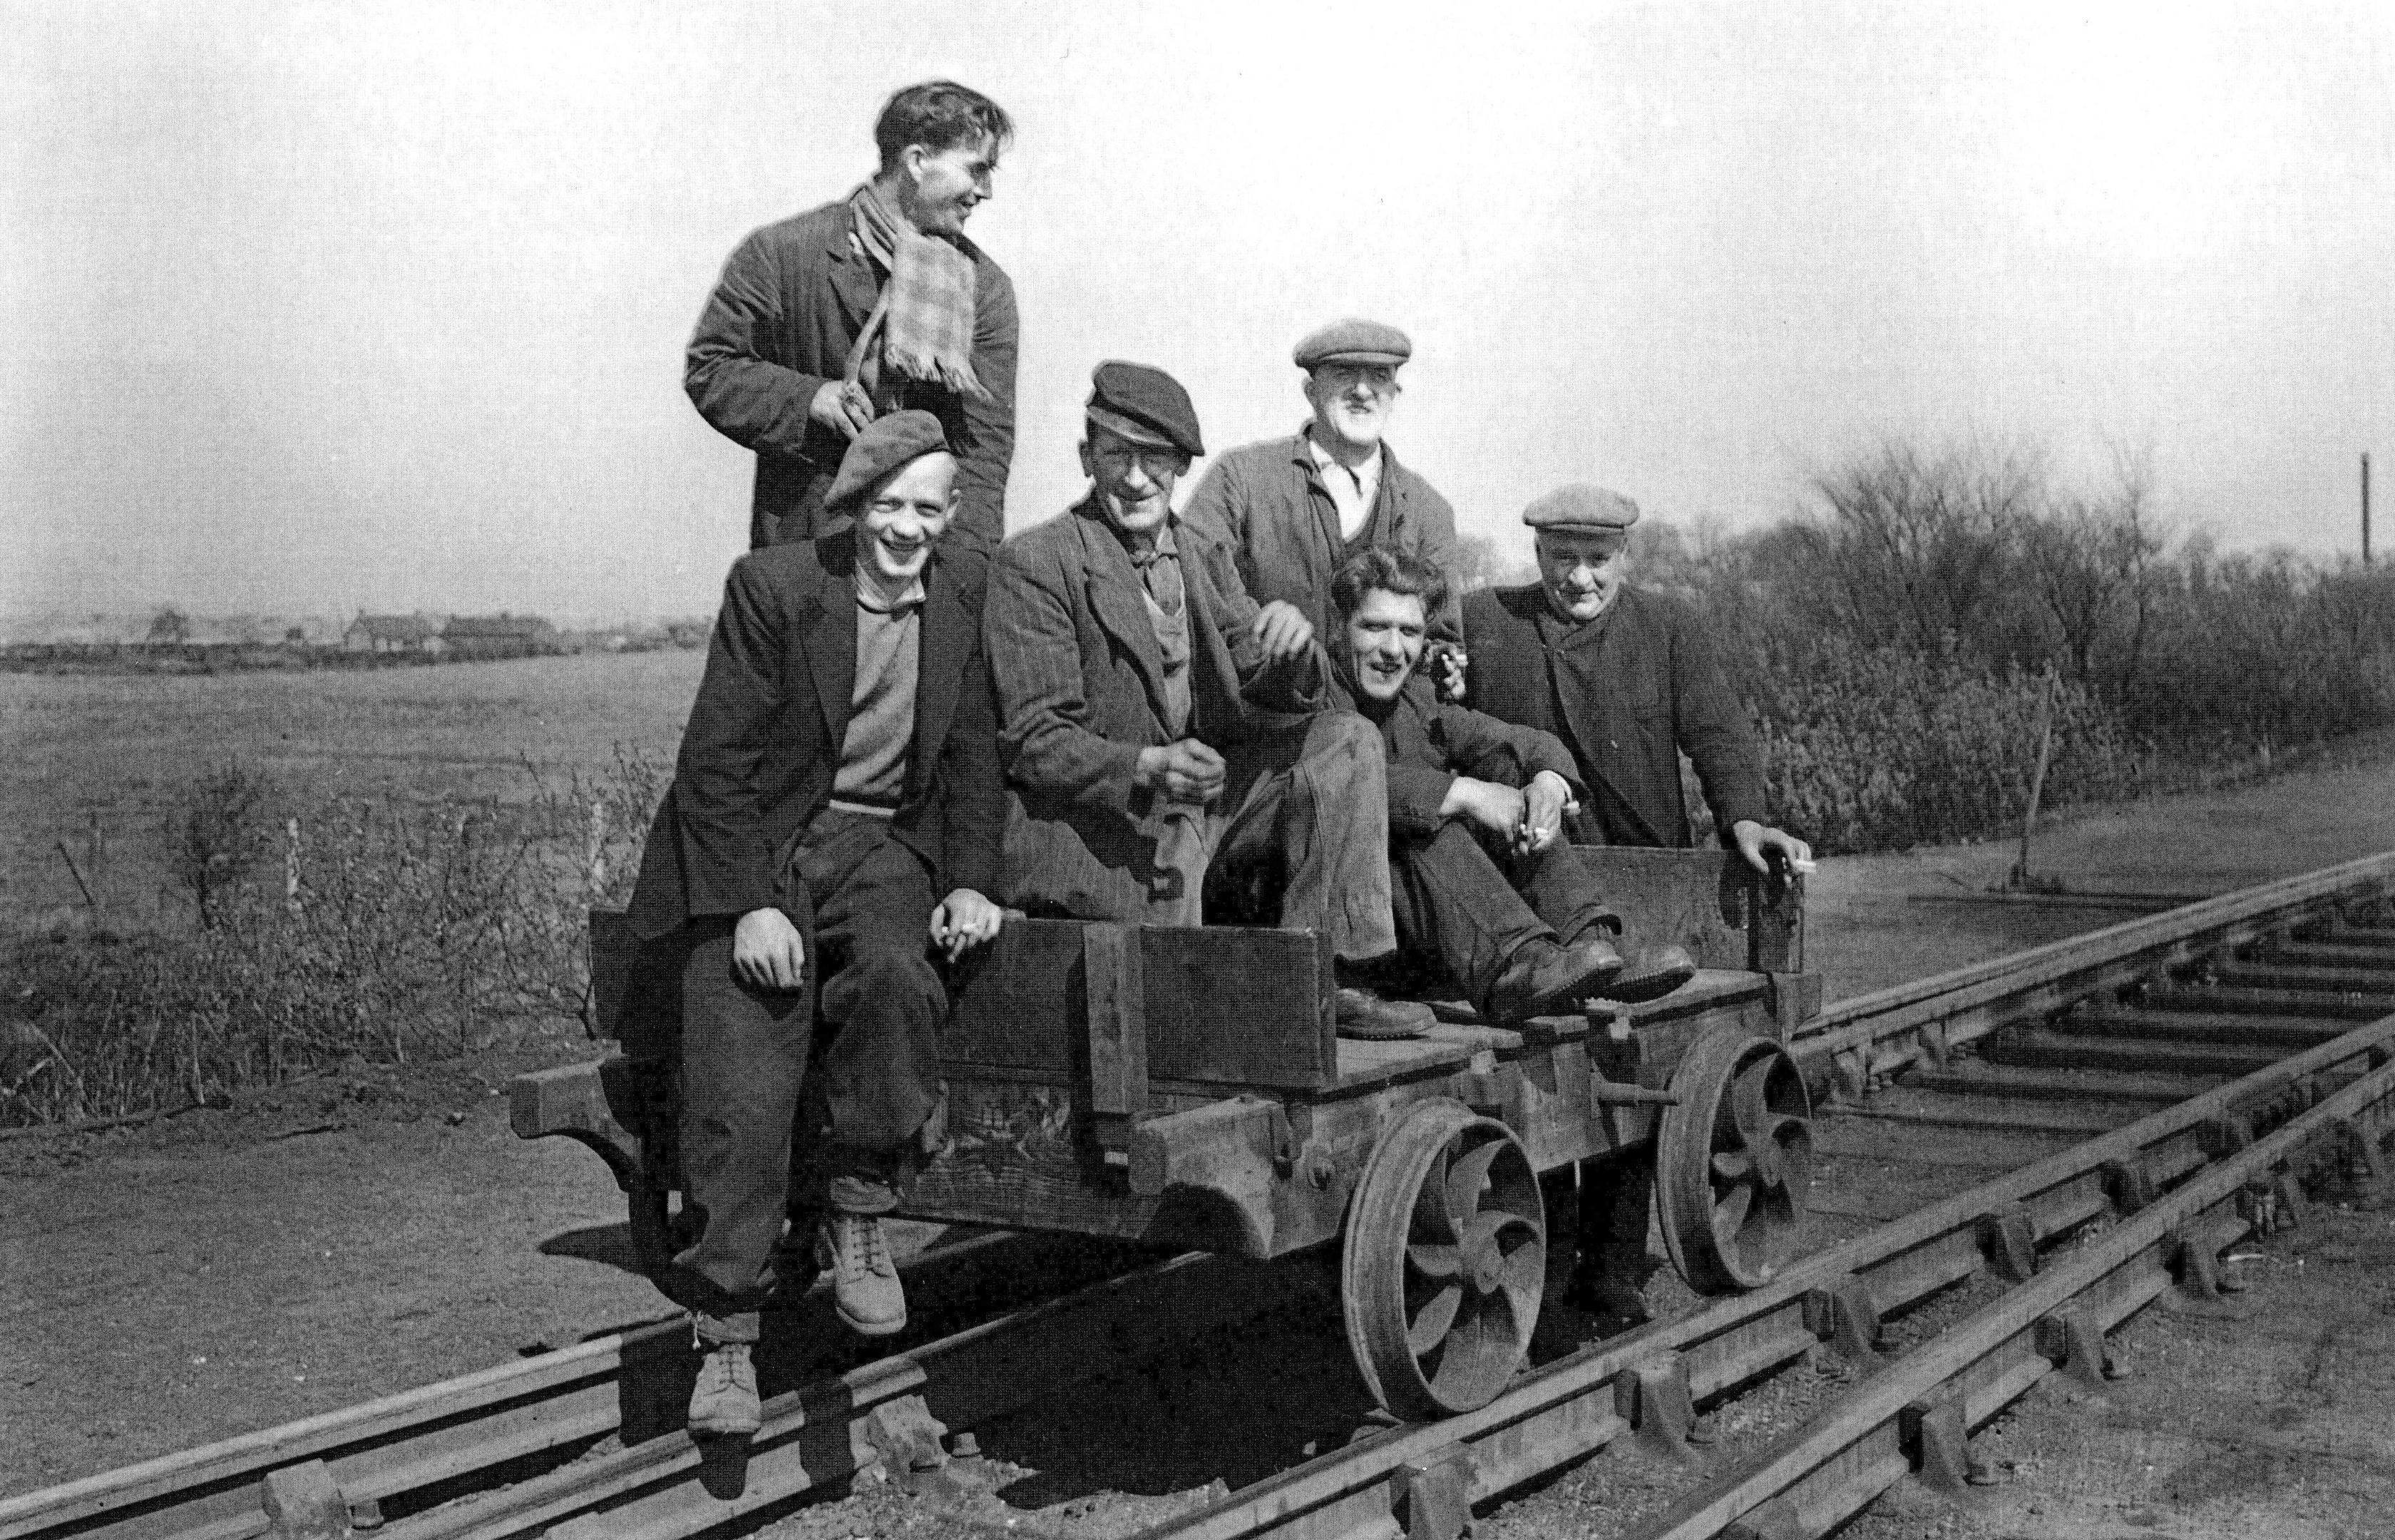 Men on the train tracks